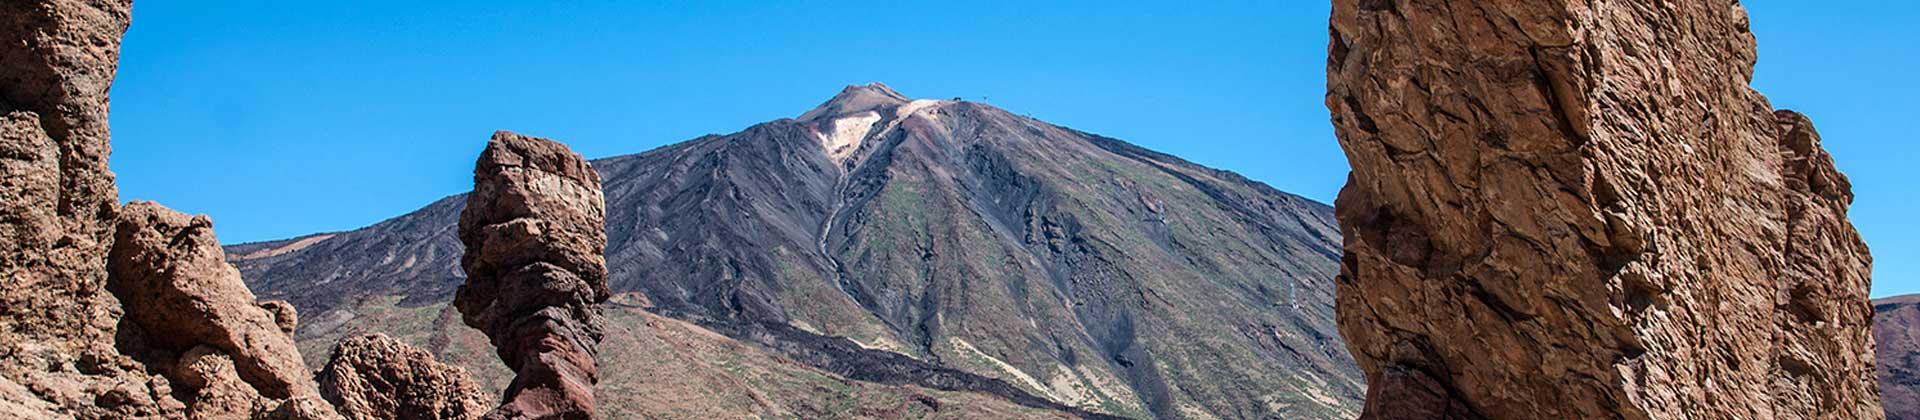 https://www.goodmorningtenerife.com/wp-content/uploads/2014/08/04_slide_teide_GM_Tenerife.jpg